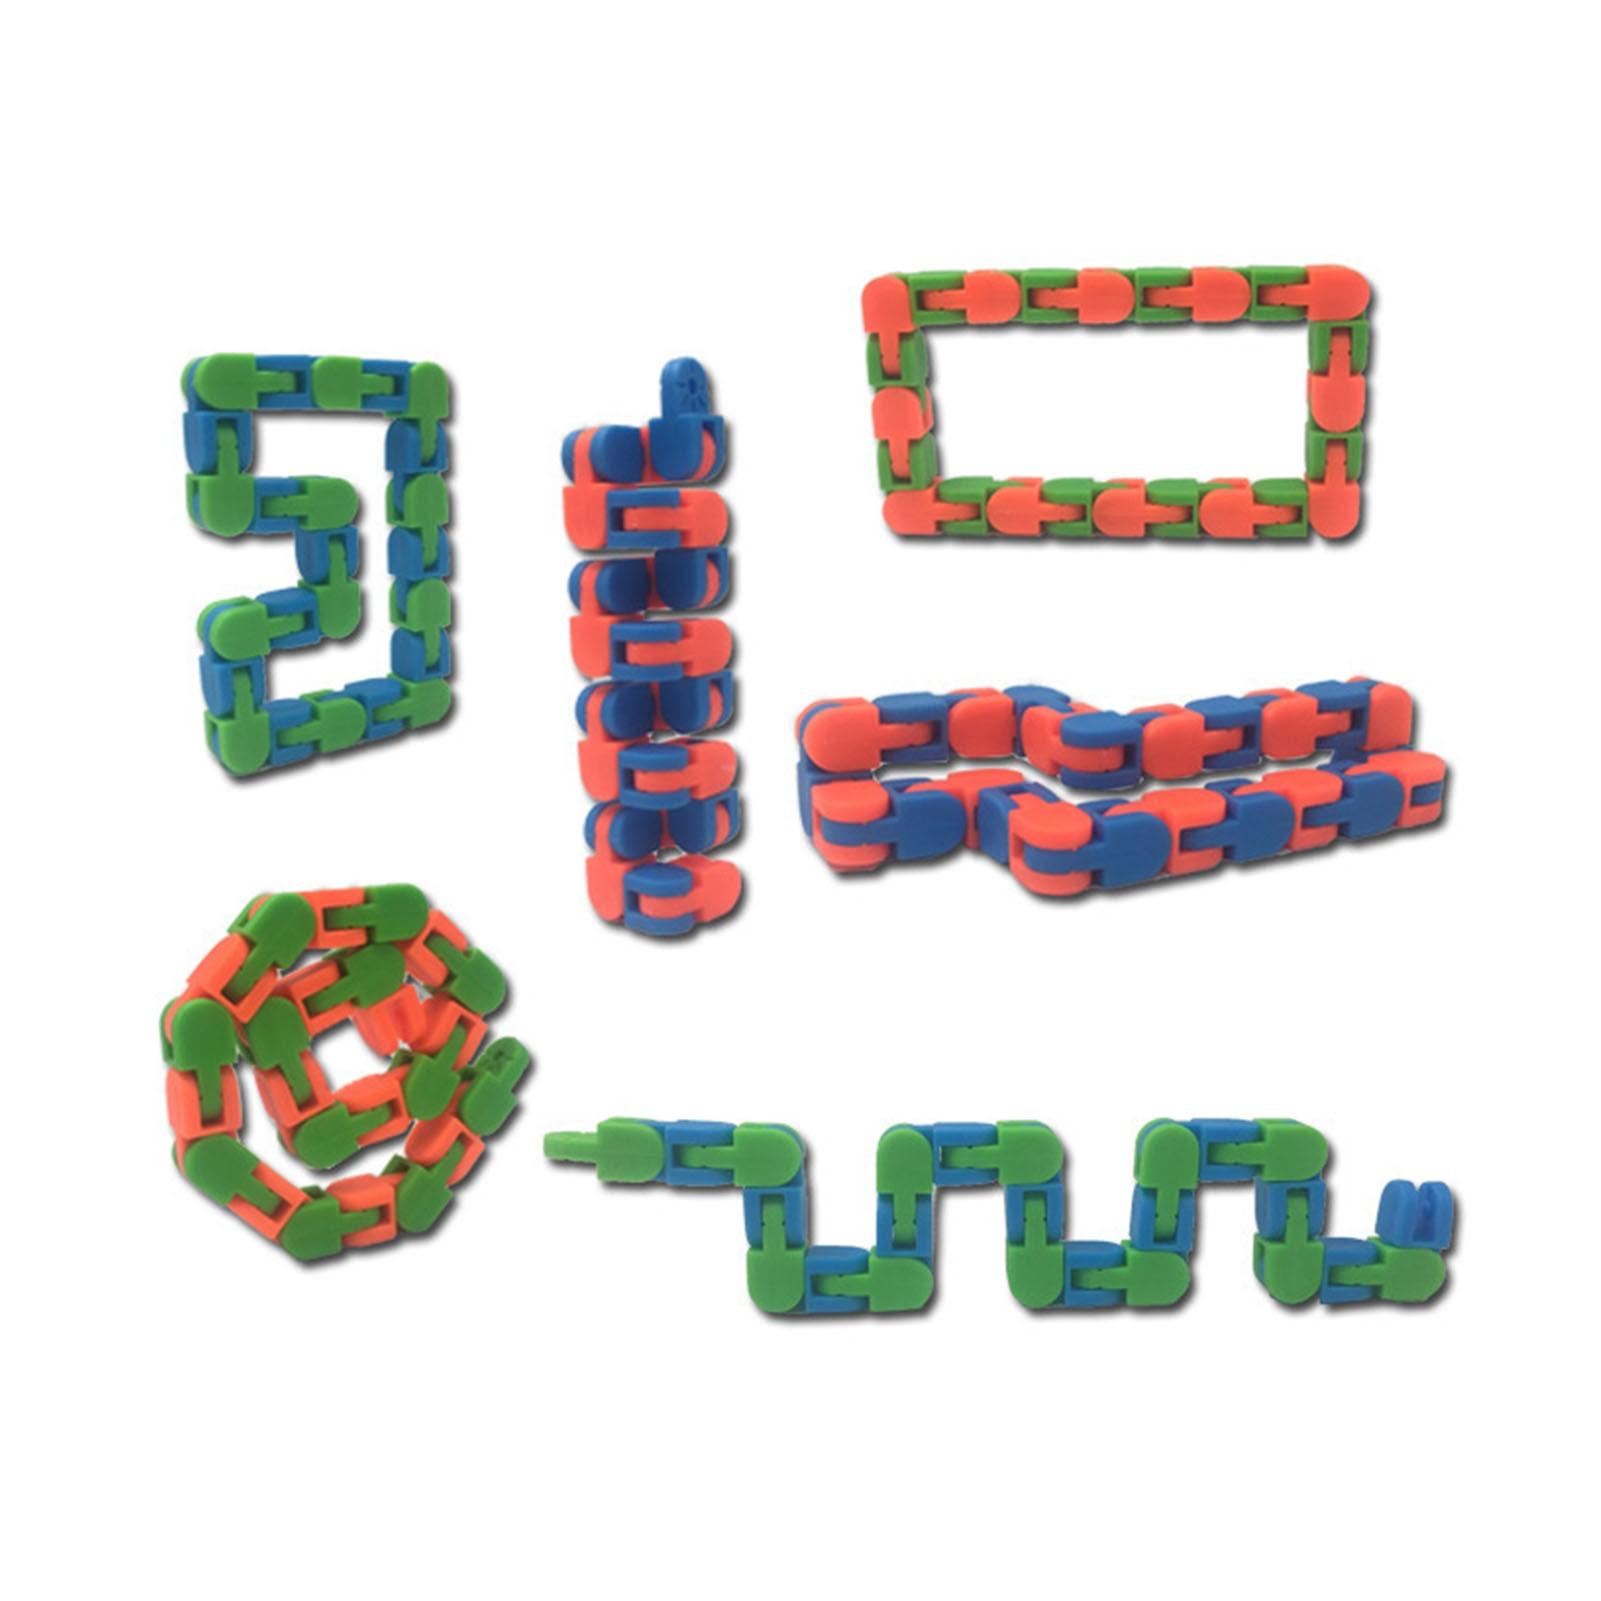 40PCS Fidget Toy Stress Relieve Balls Sensory Toy Push Bubble Sensory Anti Stress Relief Toy enlarge